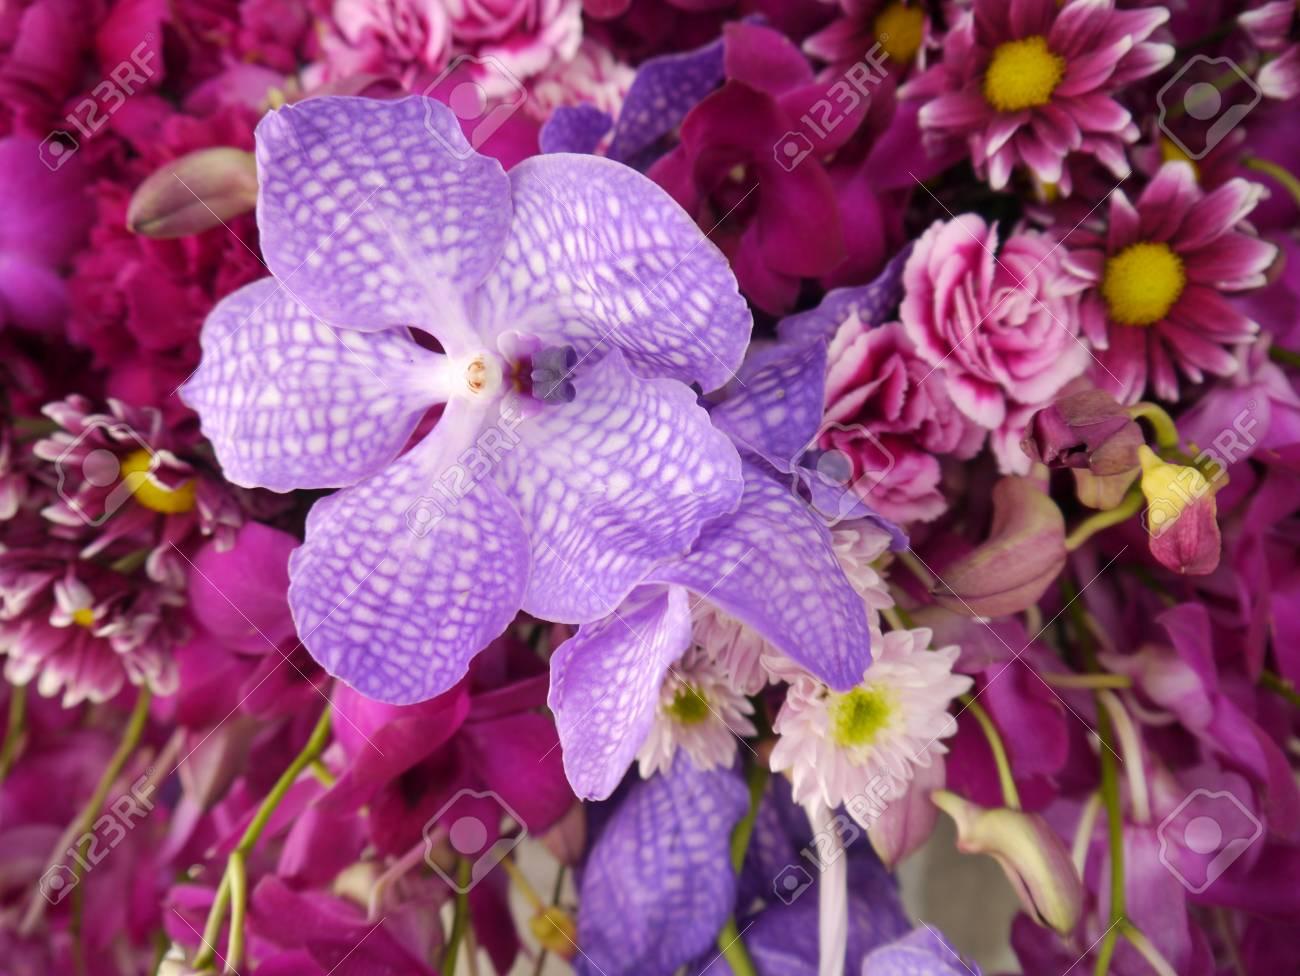 Pink purple flower bouquet orhid stock photo picture and royalty pink purple flower bouquet orhid stock photo 58397102 mightylinksfo